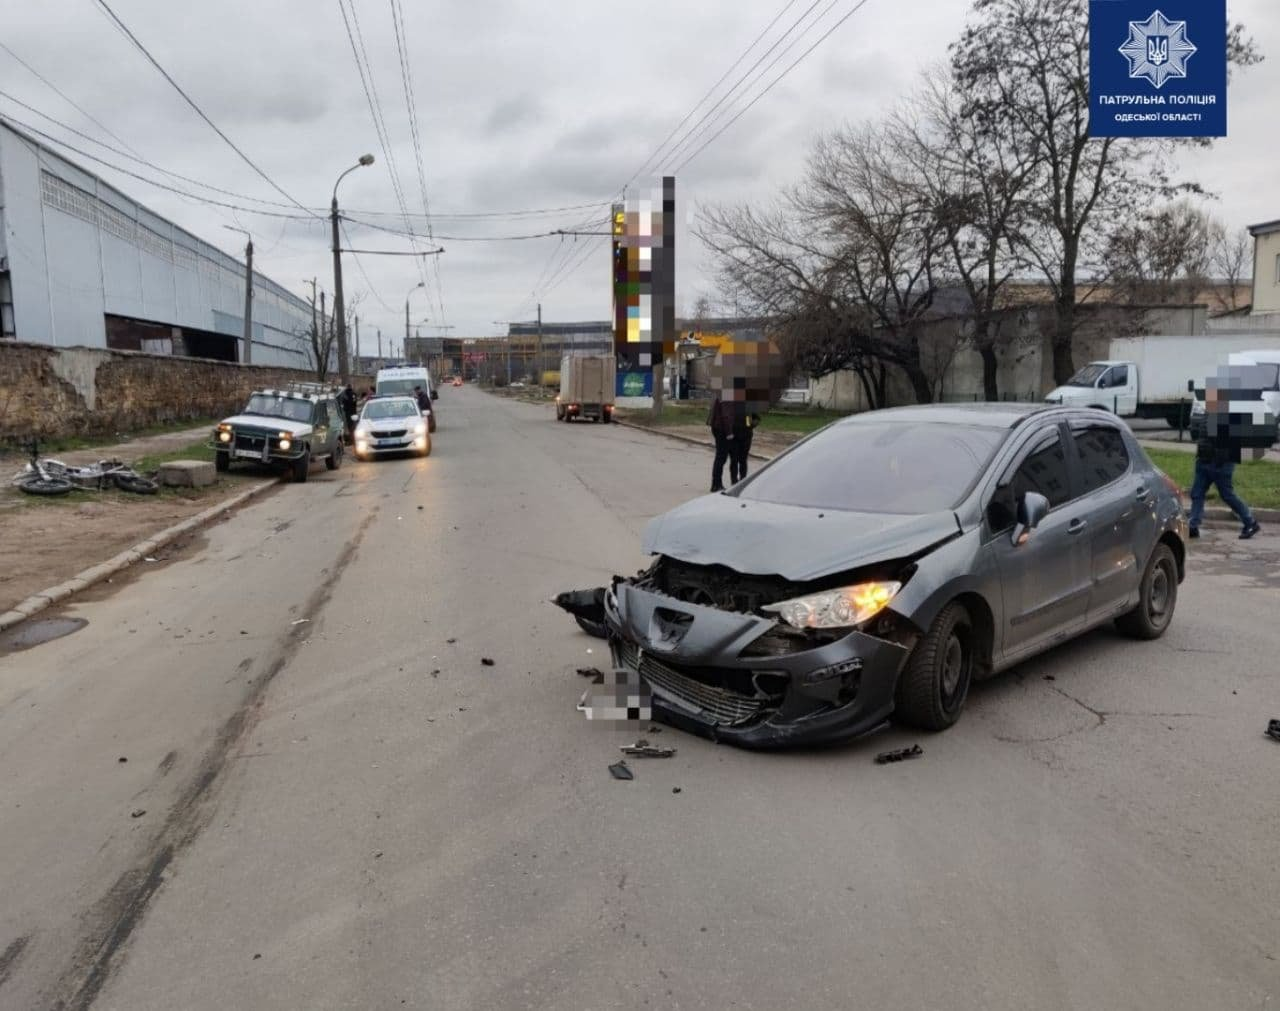 В Одессе в ДТП пострадал мотоциклист, - ФОТО, фото-3